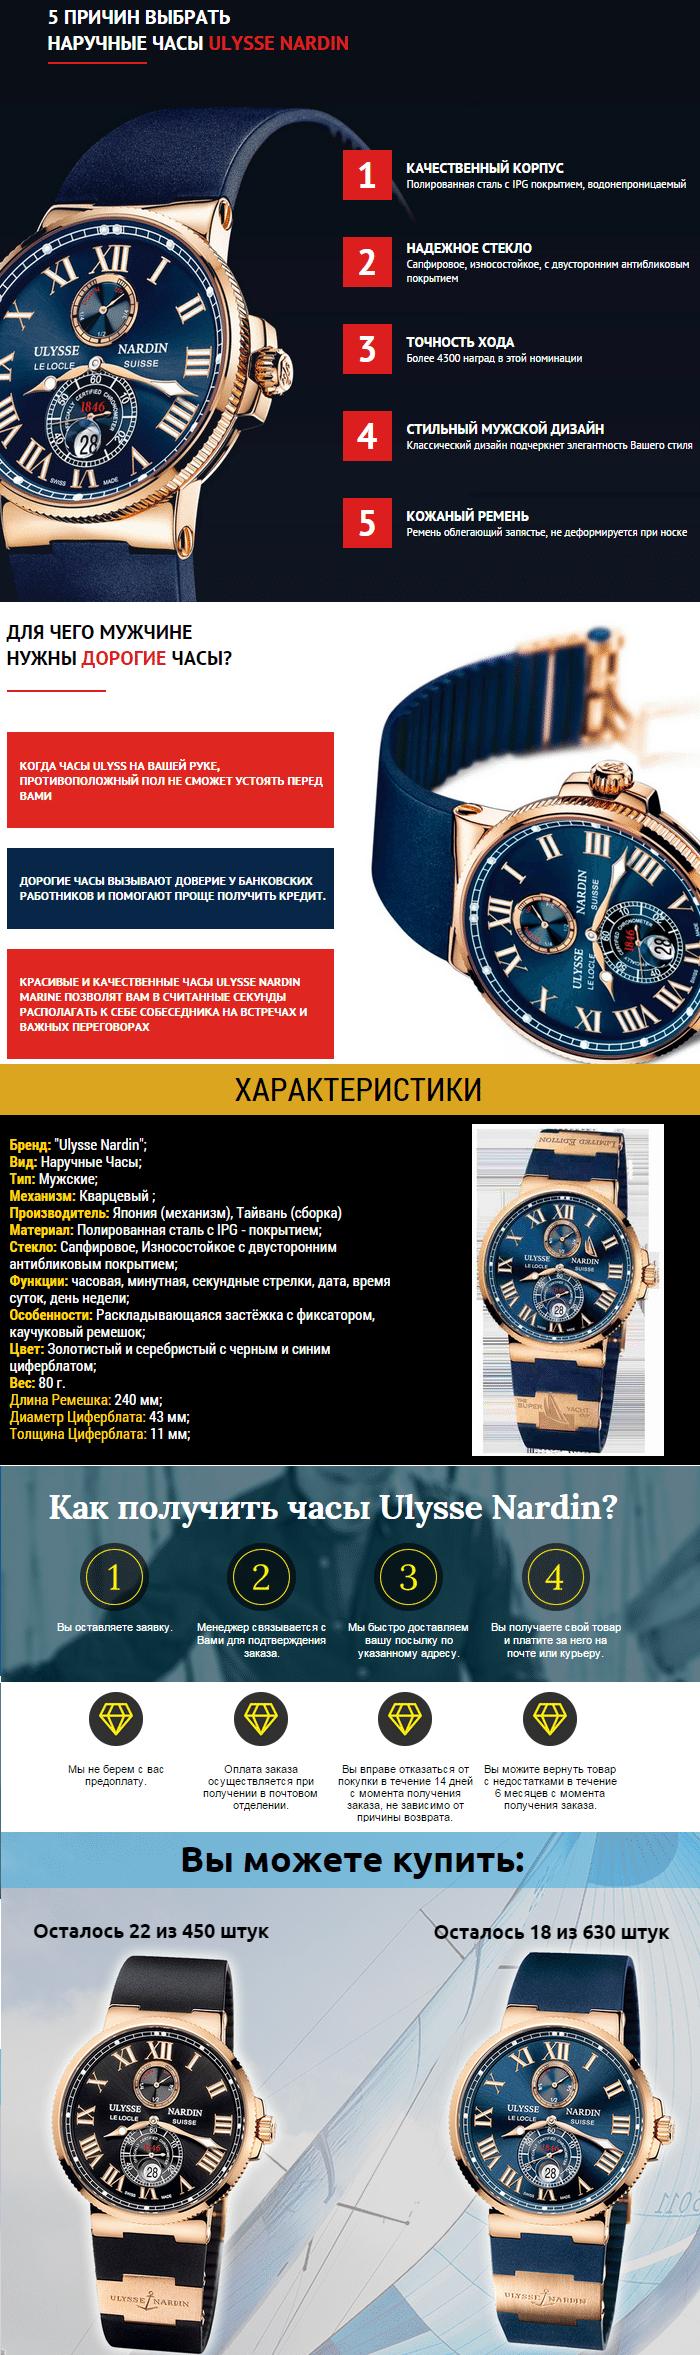 Мужские часы Ulysse Nardin Marine Chronometer (реплика) - фото Часы Ulysse Nardin